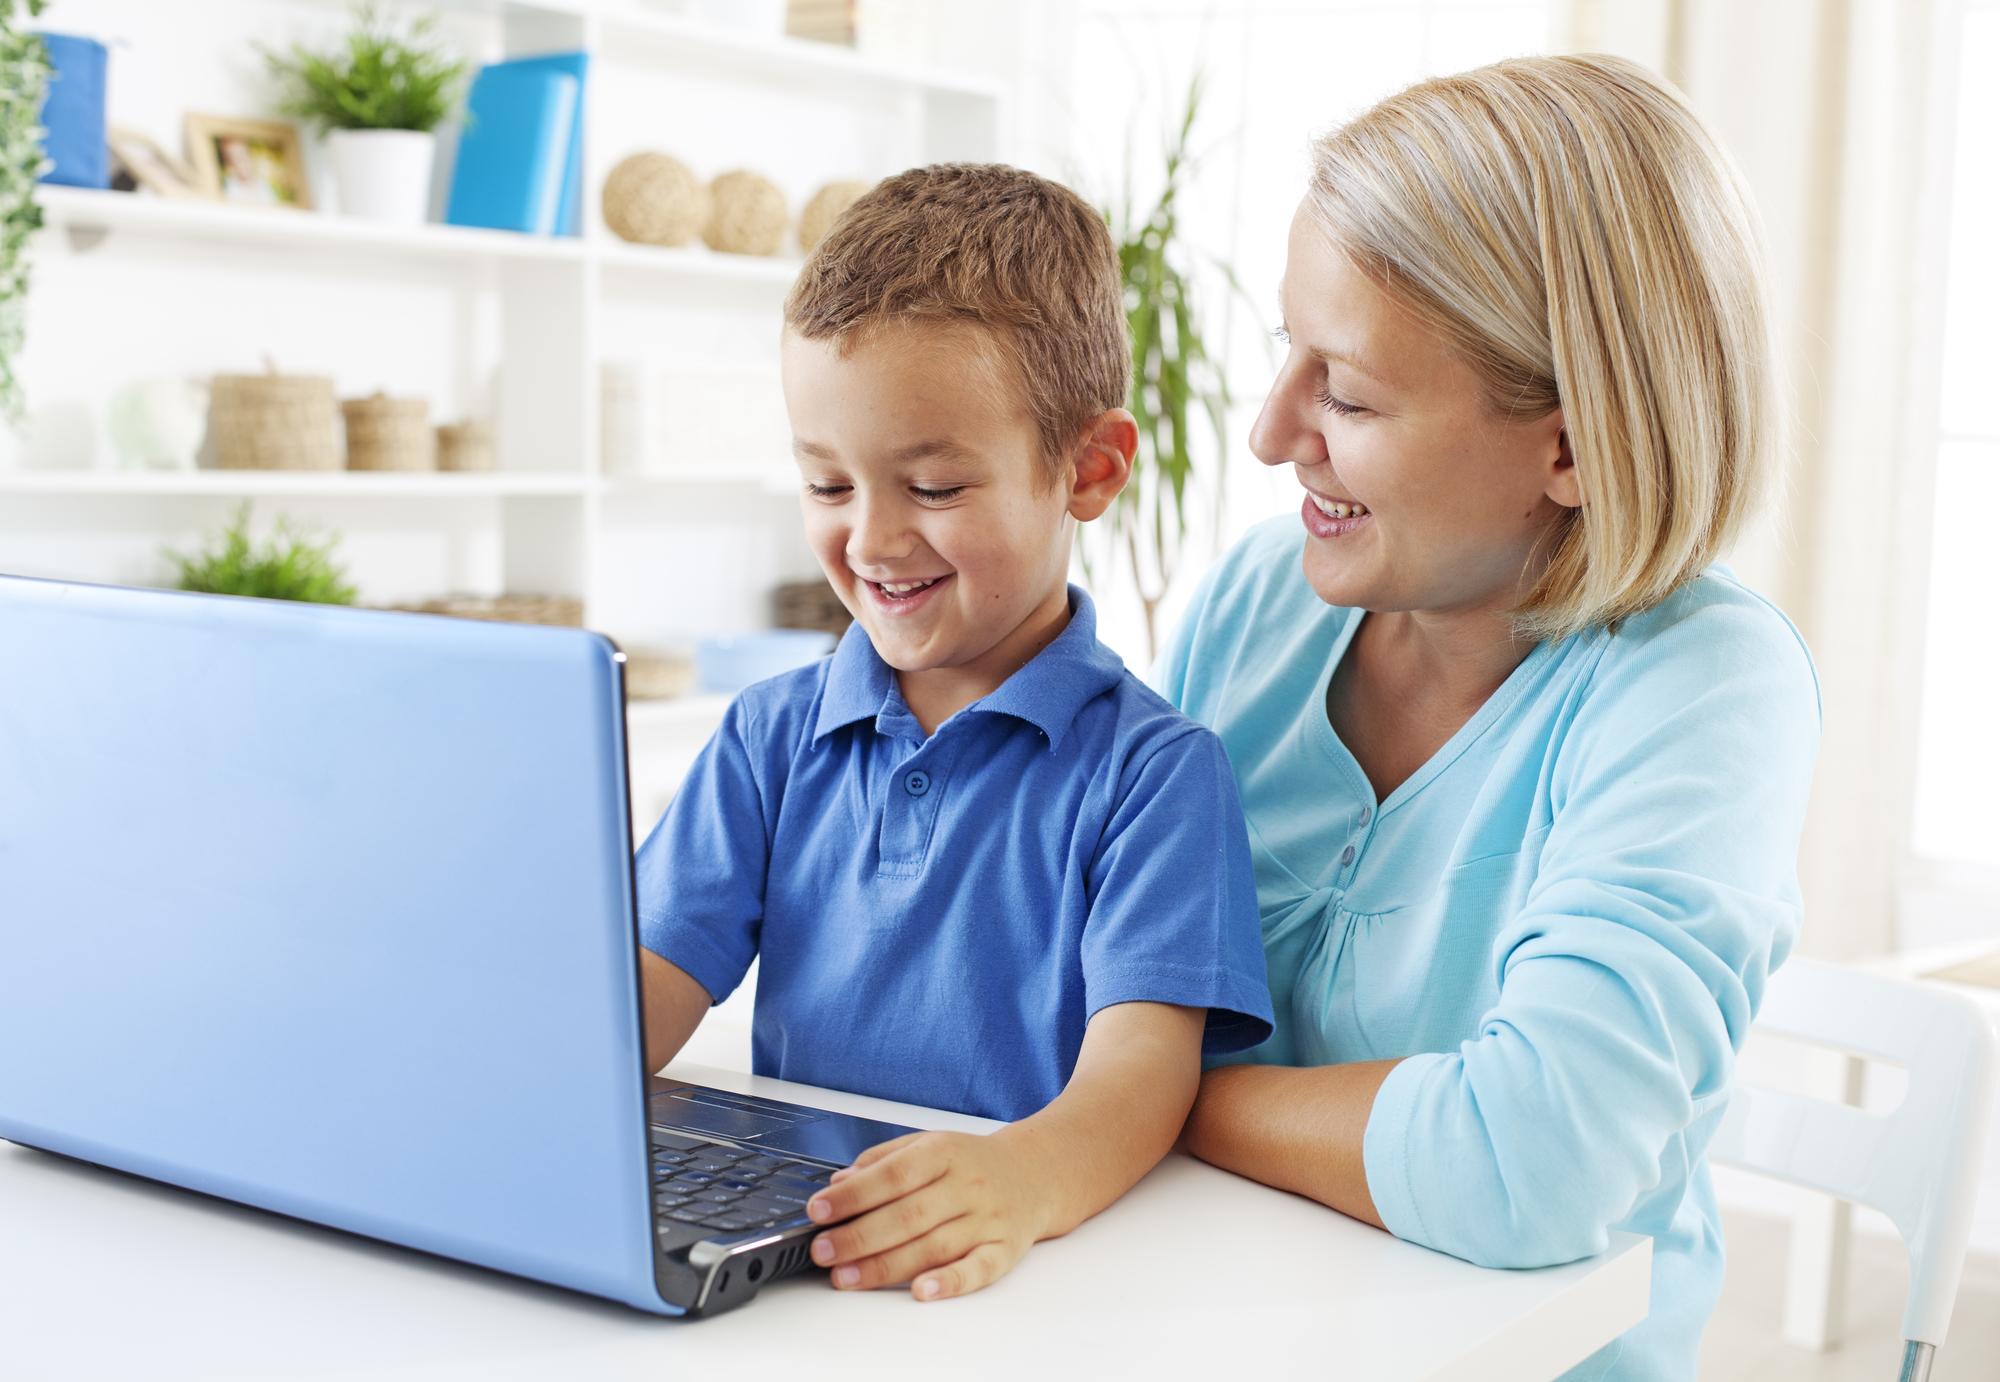 Summer Speech articulation therapy online in Wisconsin